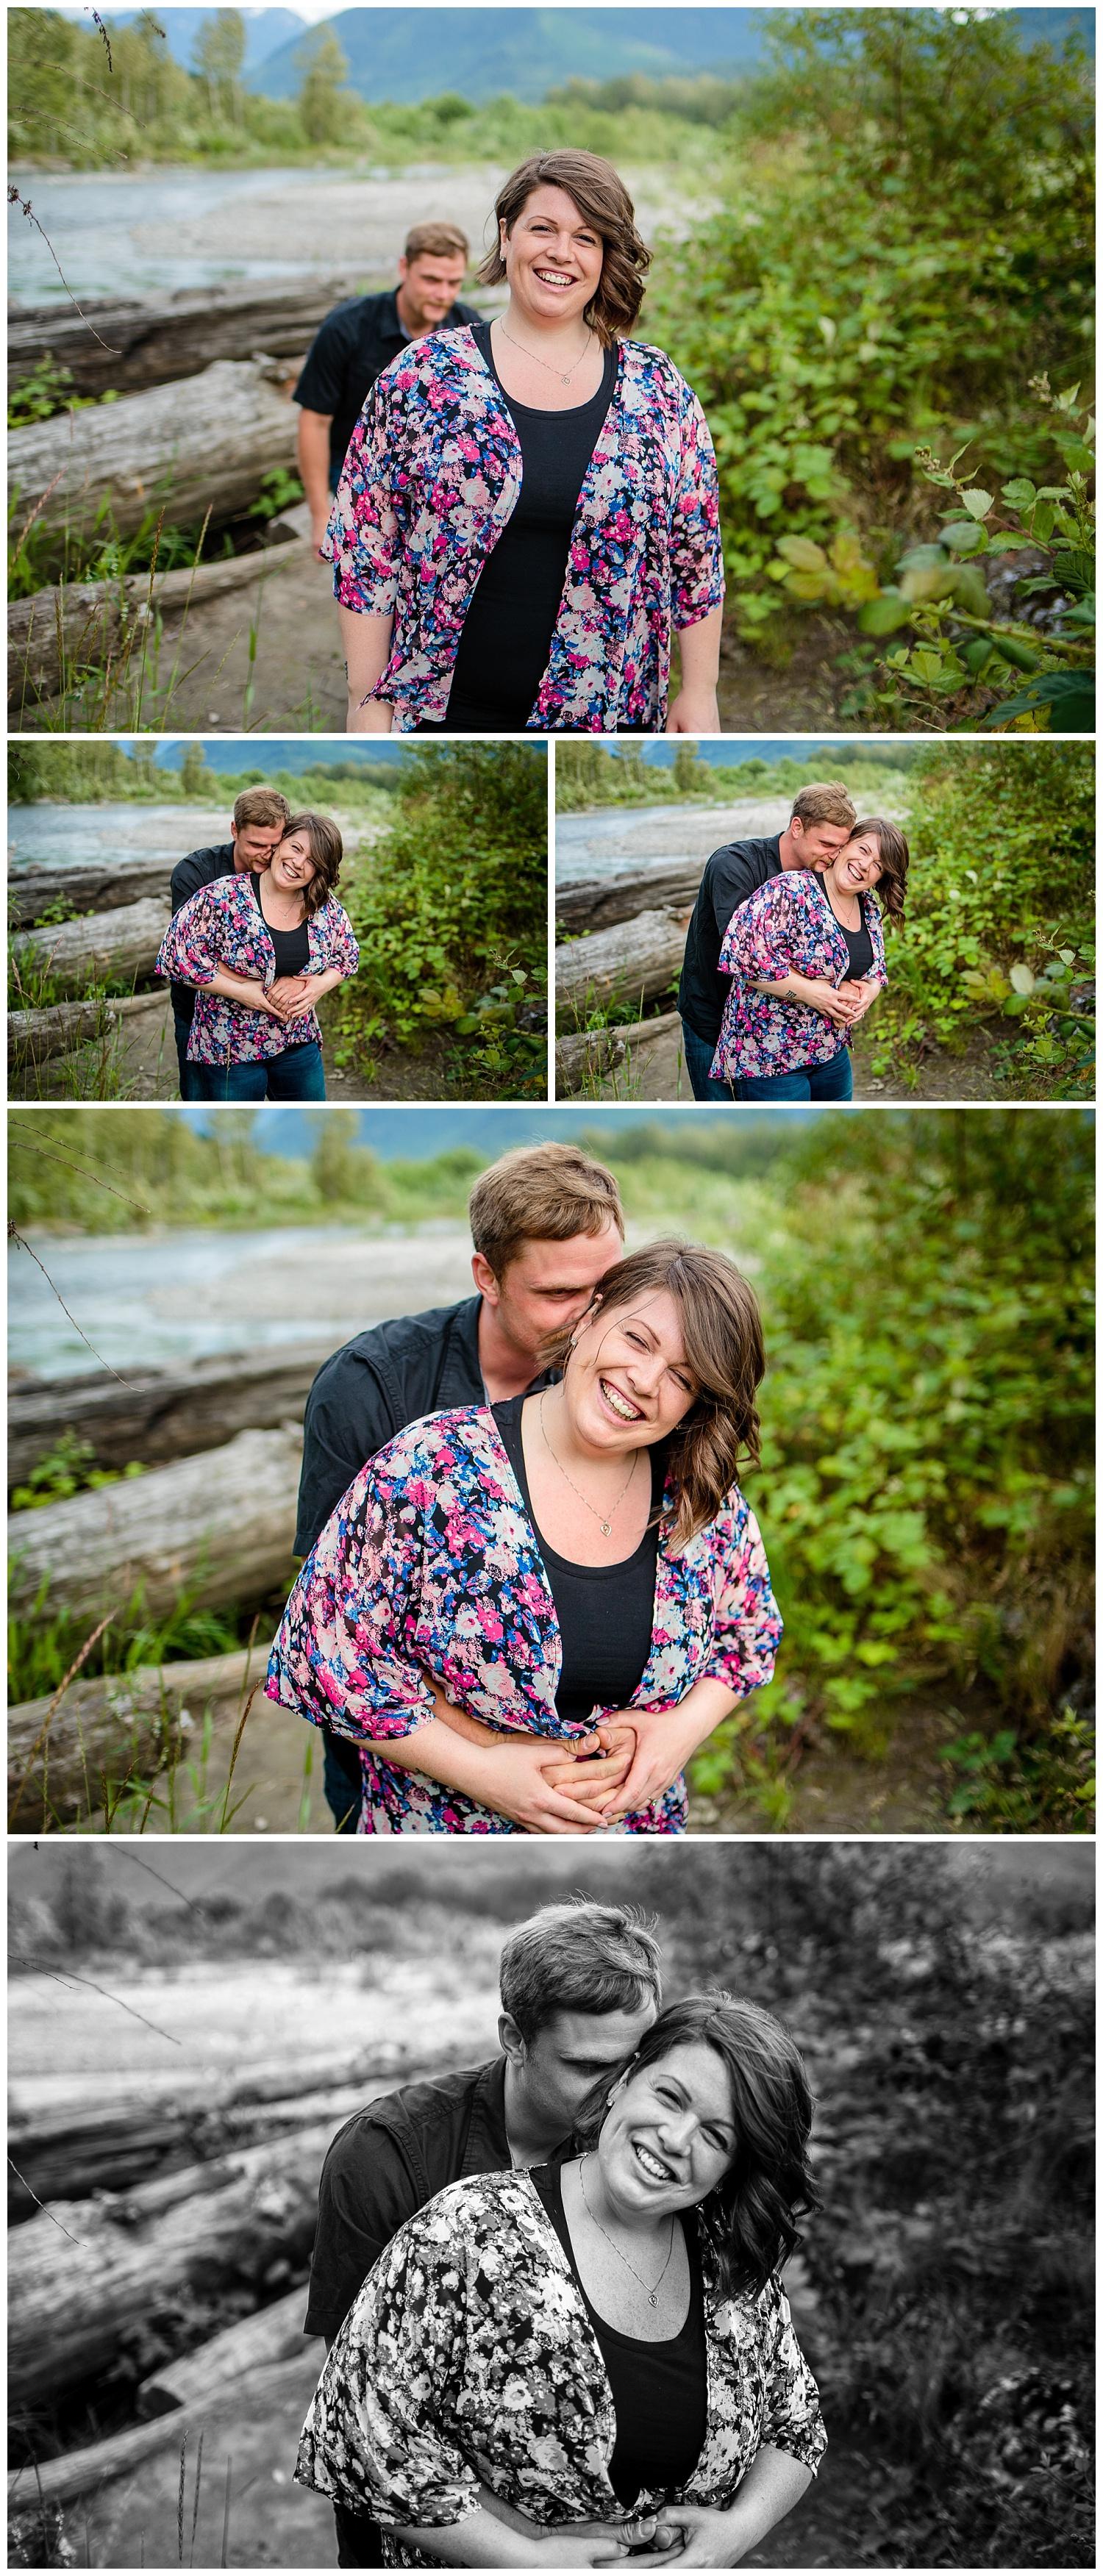 Chilliwack River Bank Mountain Chilliwack Fun  Engagement Photographer 078_collage.jpg